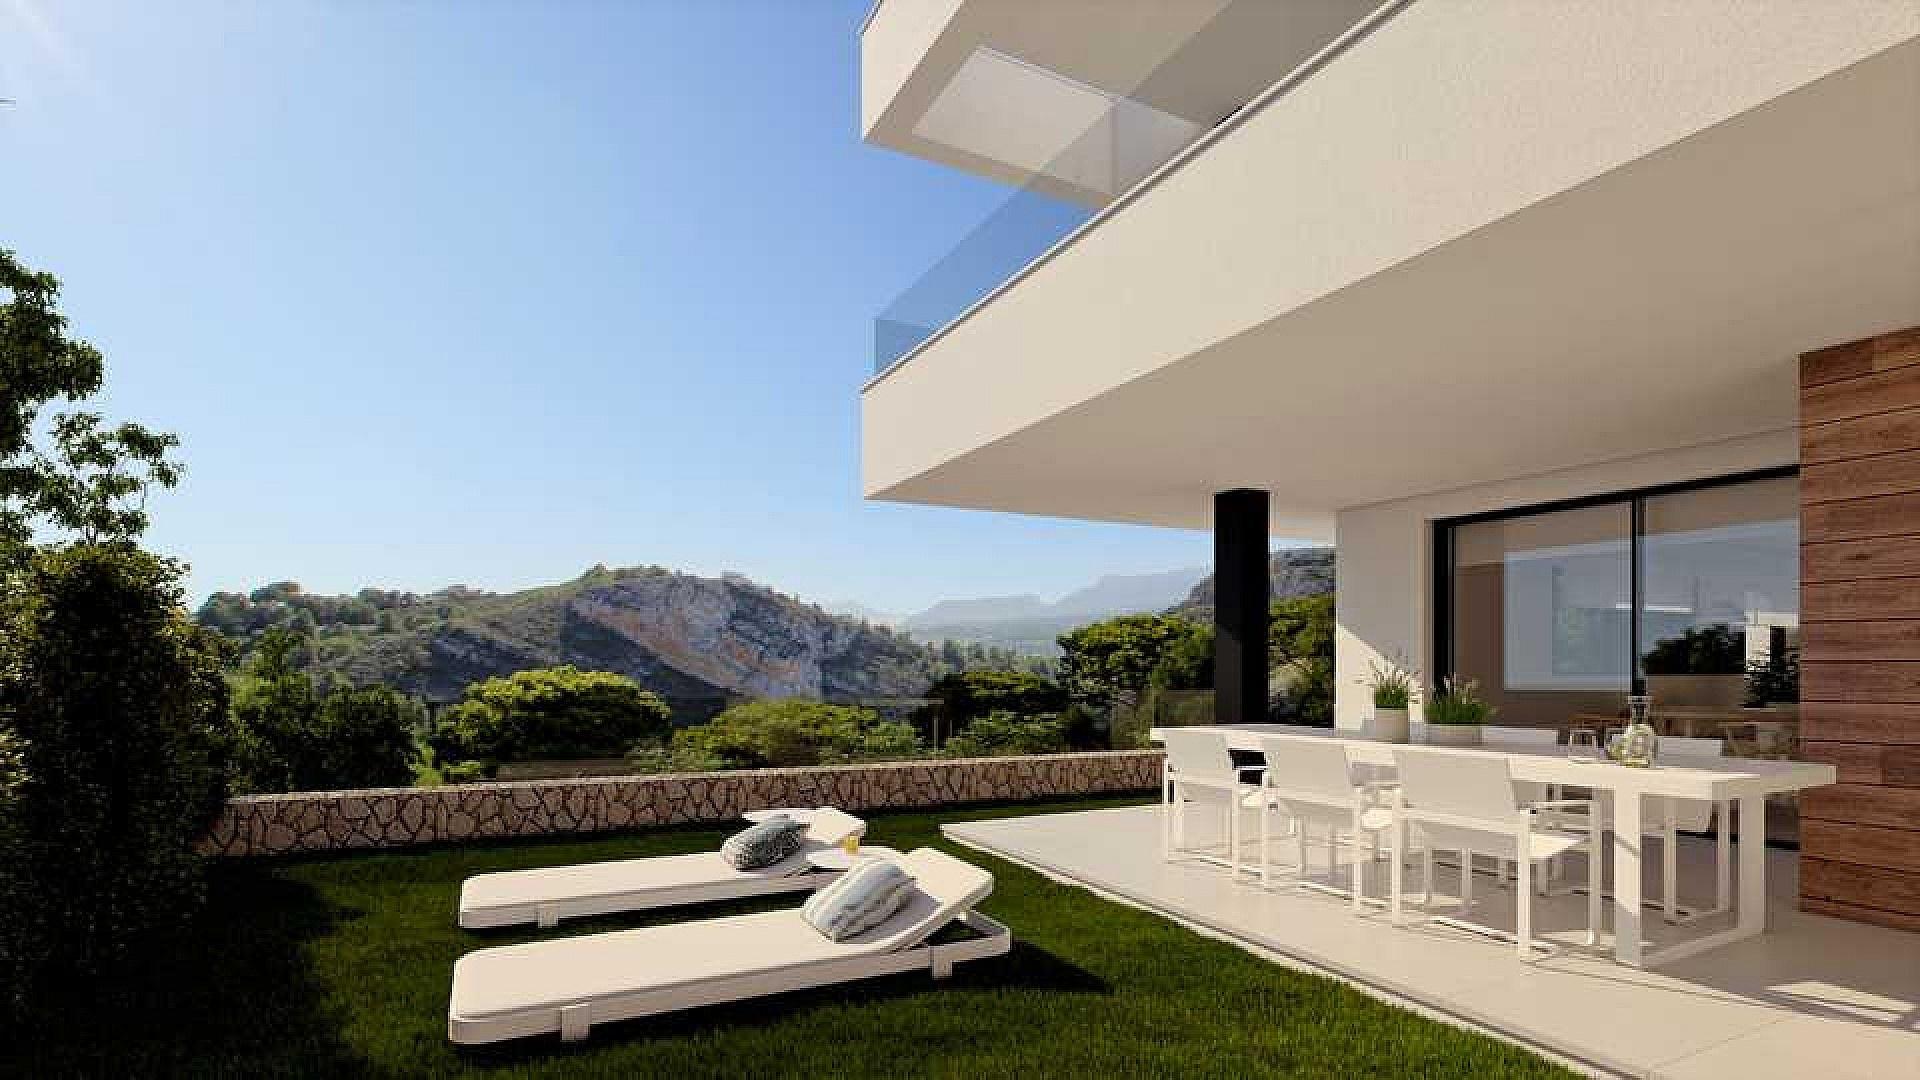 w_12215.1.vista-terraza-final-d-sn-1.jpg